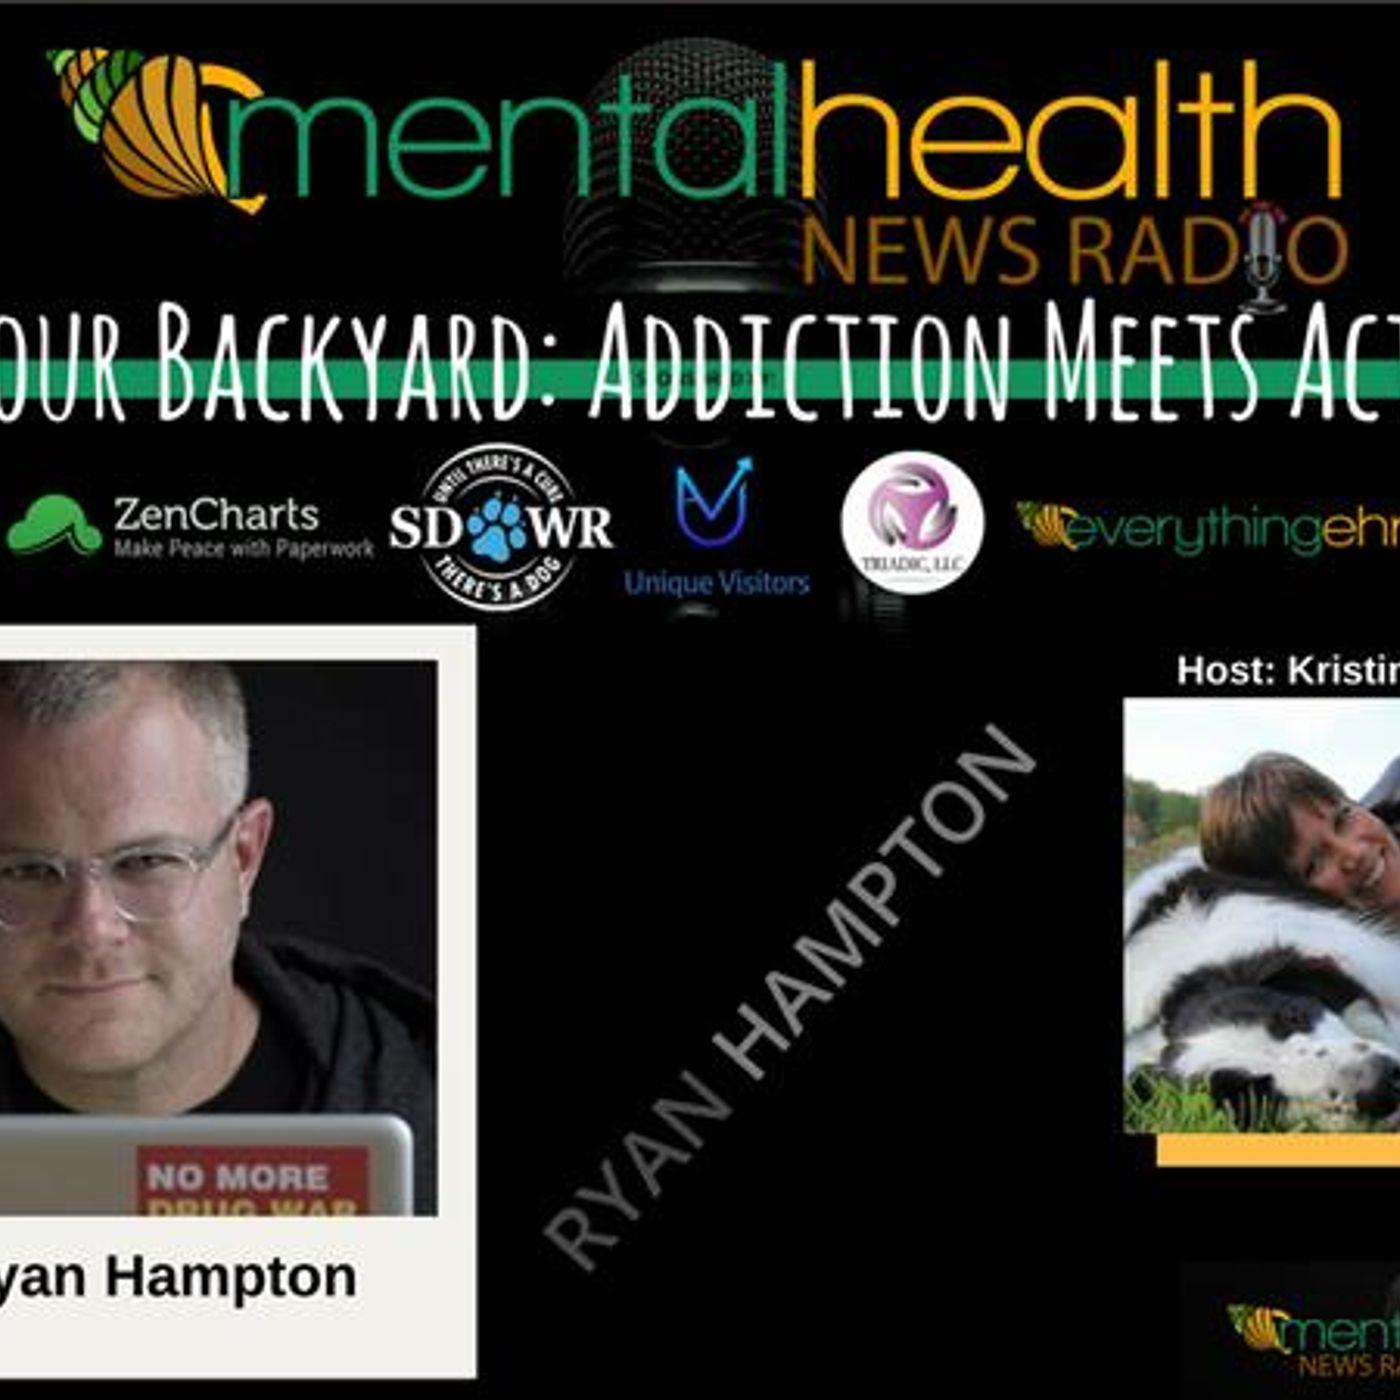 Mental Health News Radio - In Your Backyard: Addiction Meets Action with Ryan Hampton